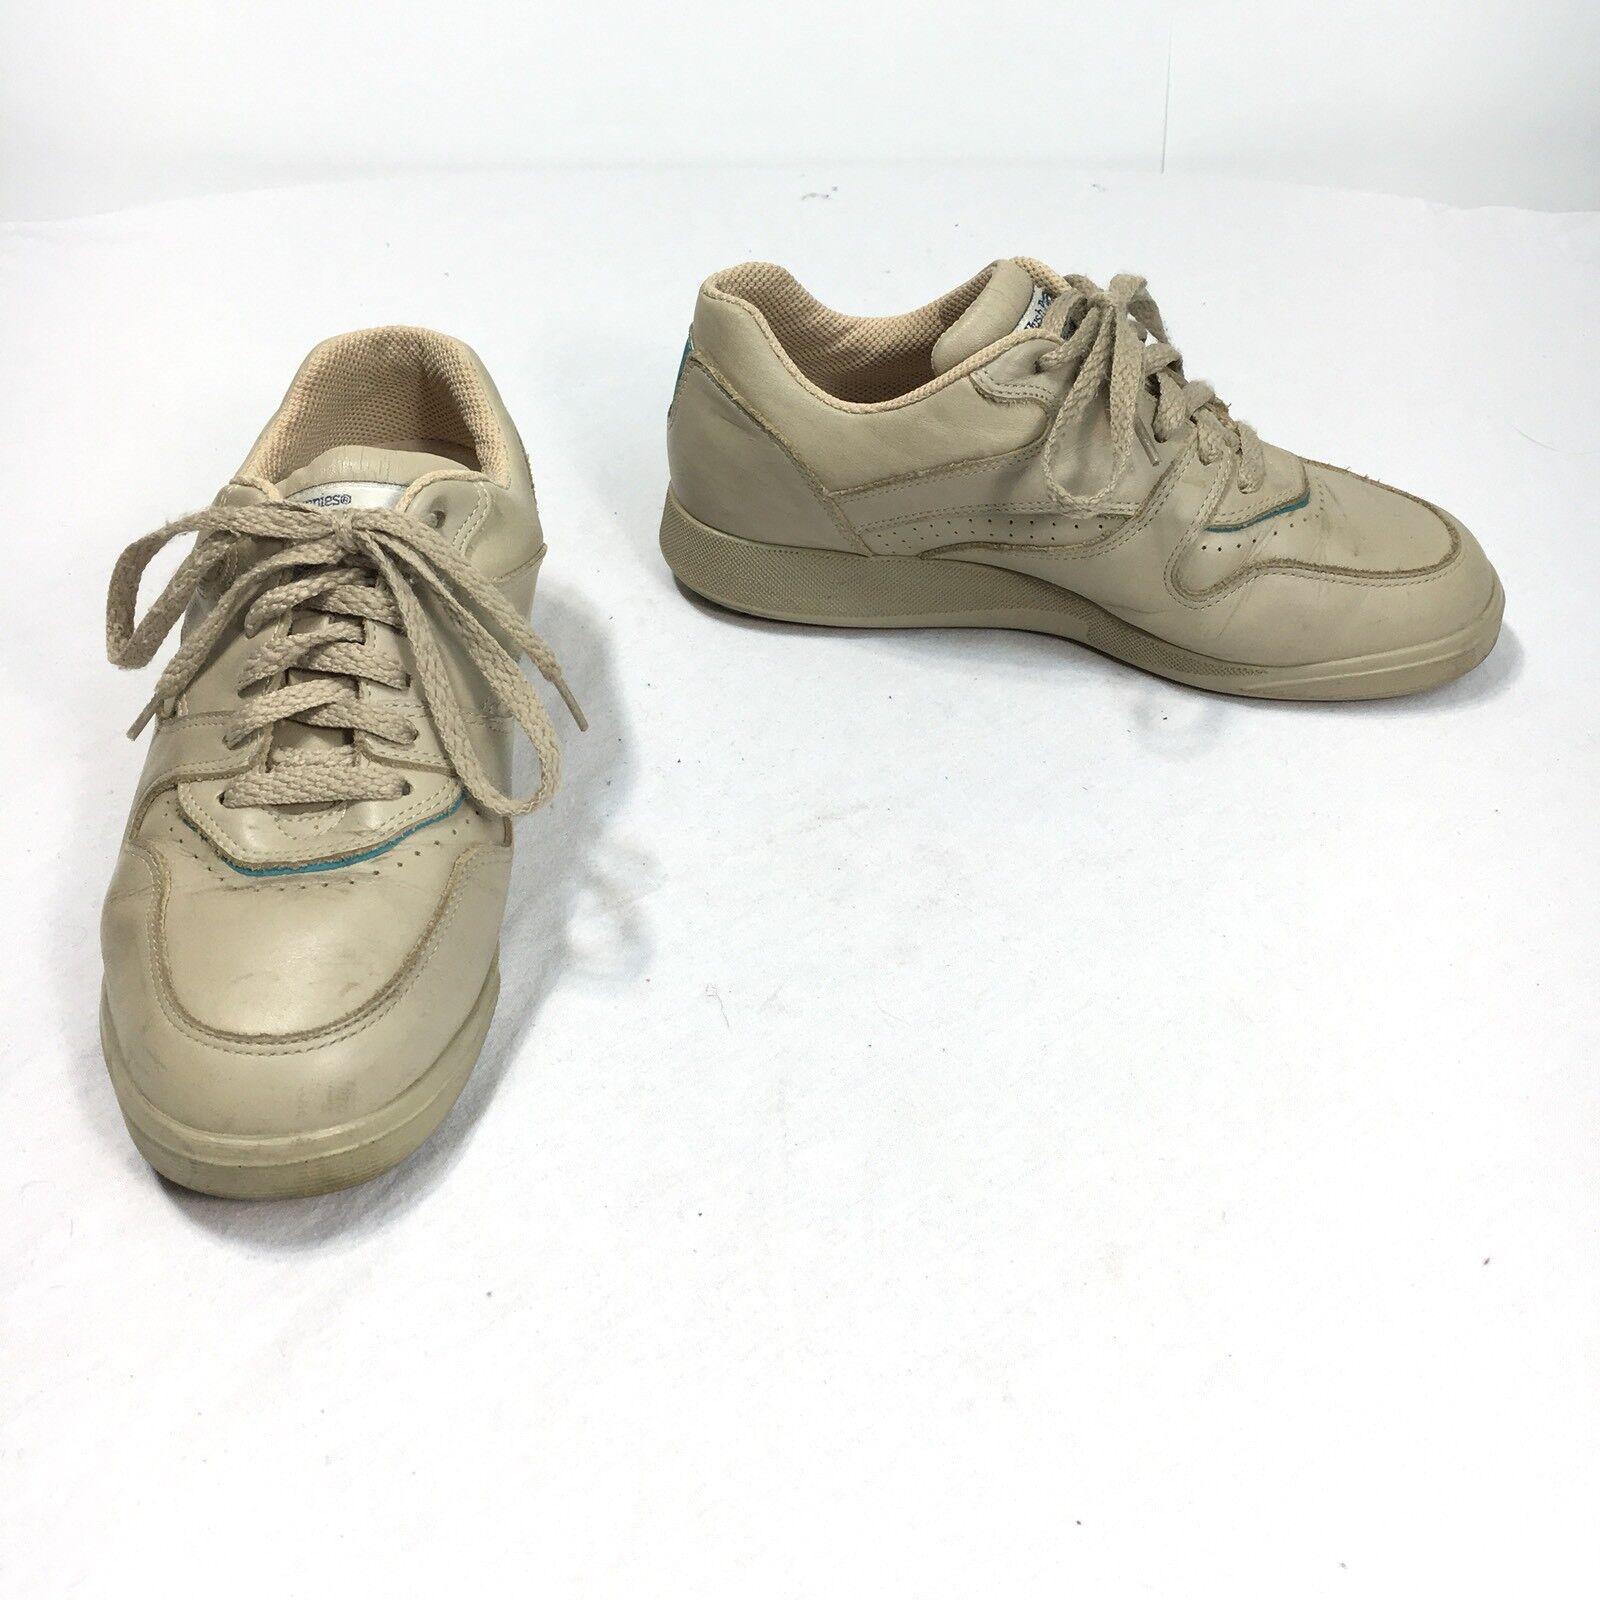 Hush Puppies Bounce Upbeat Women's 7 W Shoes Wide Brown Beige Walking Shoes W 15f5c9